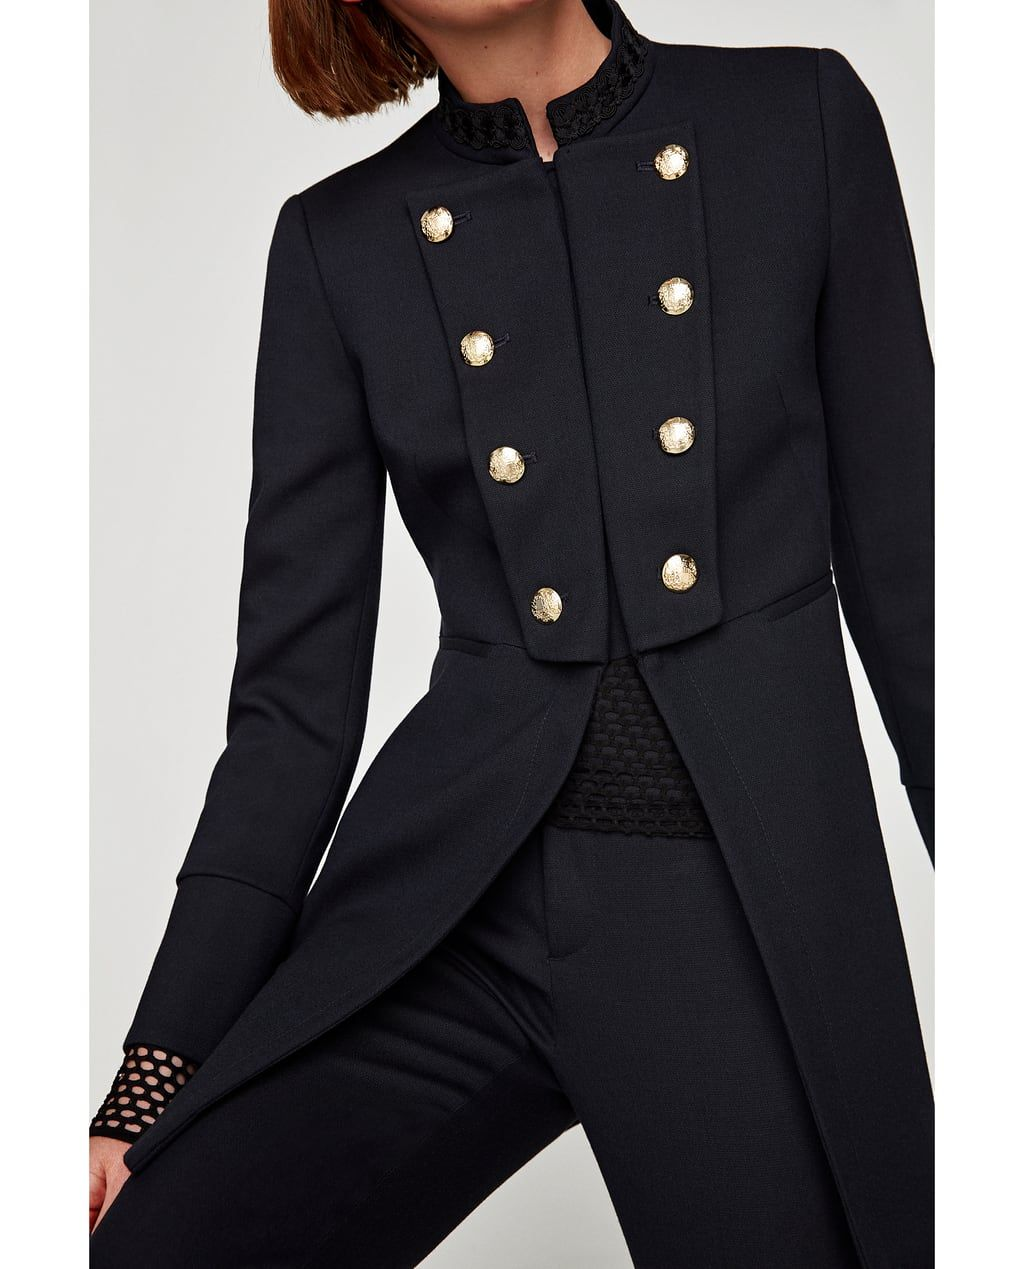 Manteau officier femme zara